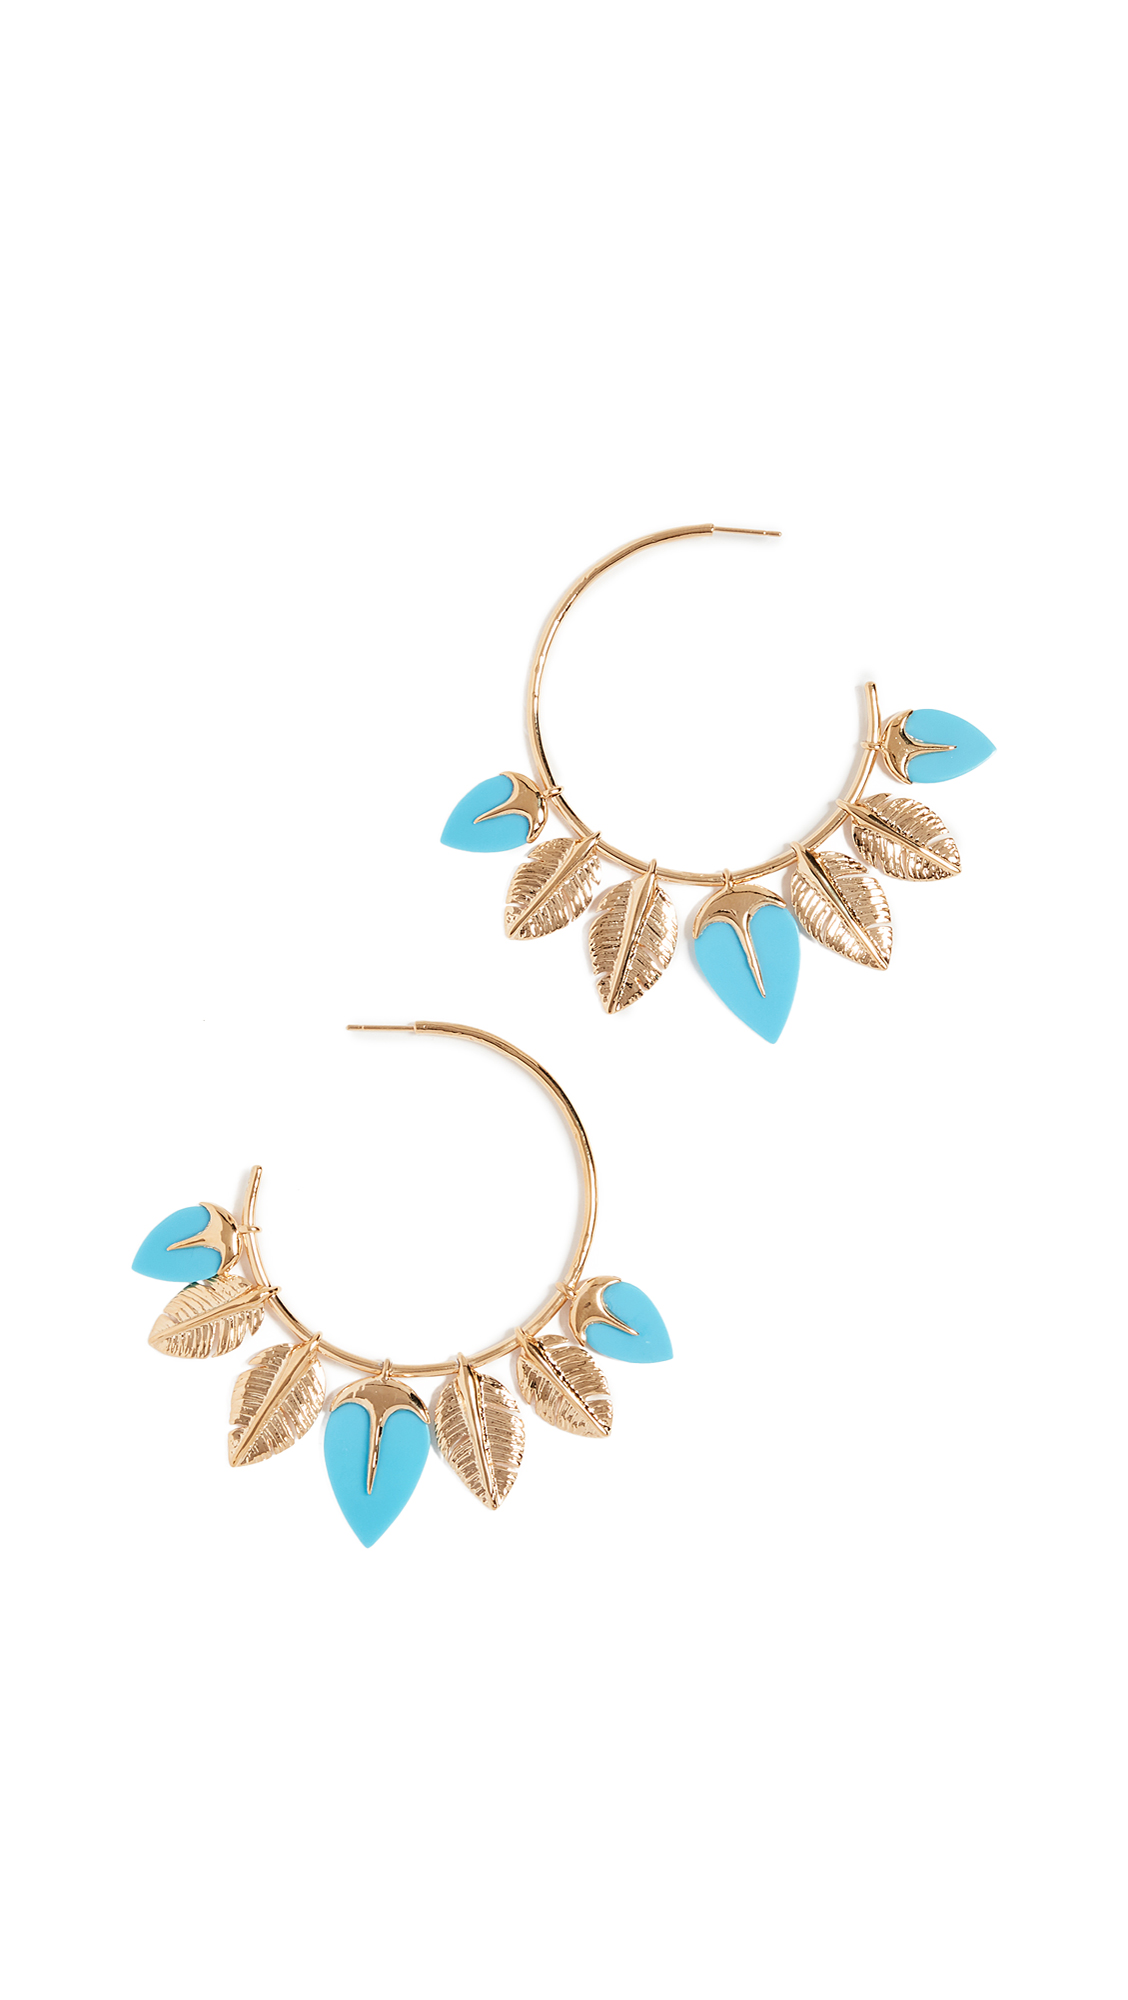 Aurélie Bidermann Thalitha Hoop Earrings in Turquoise and 18K Gold-Plated Brass cPlRP